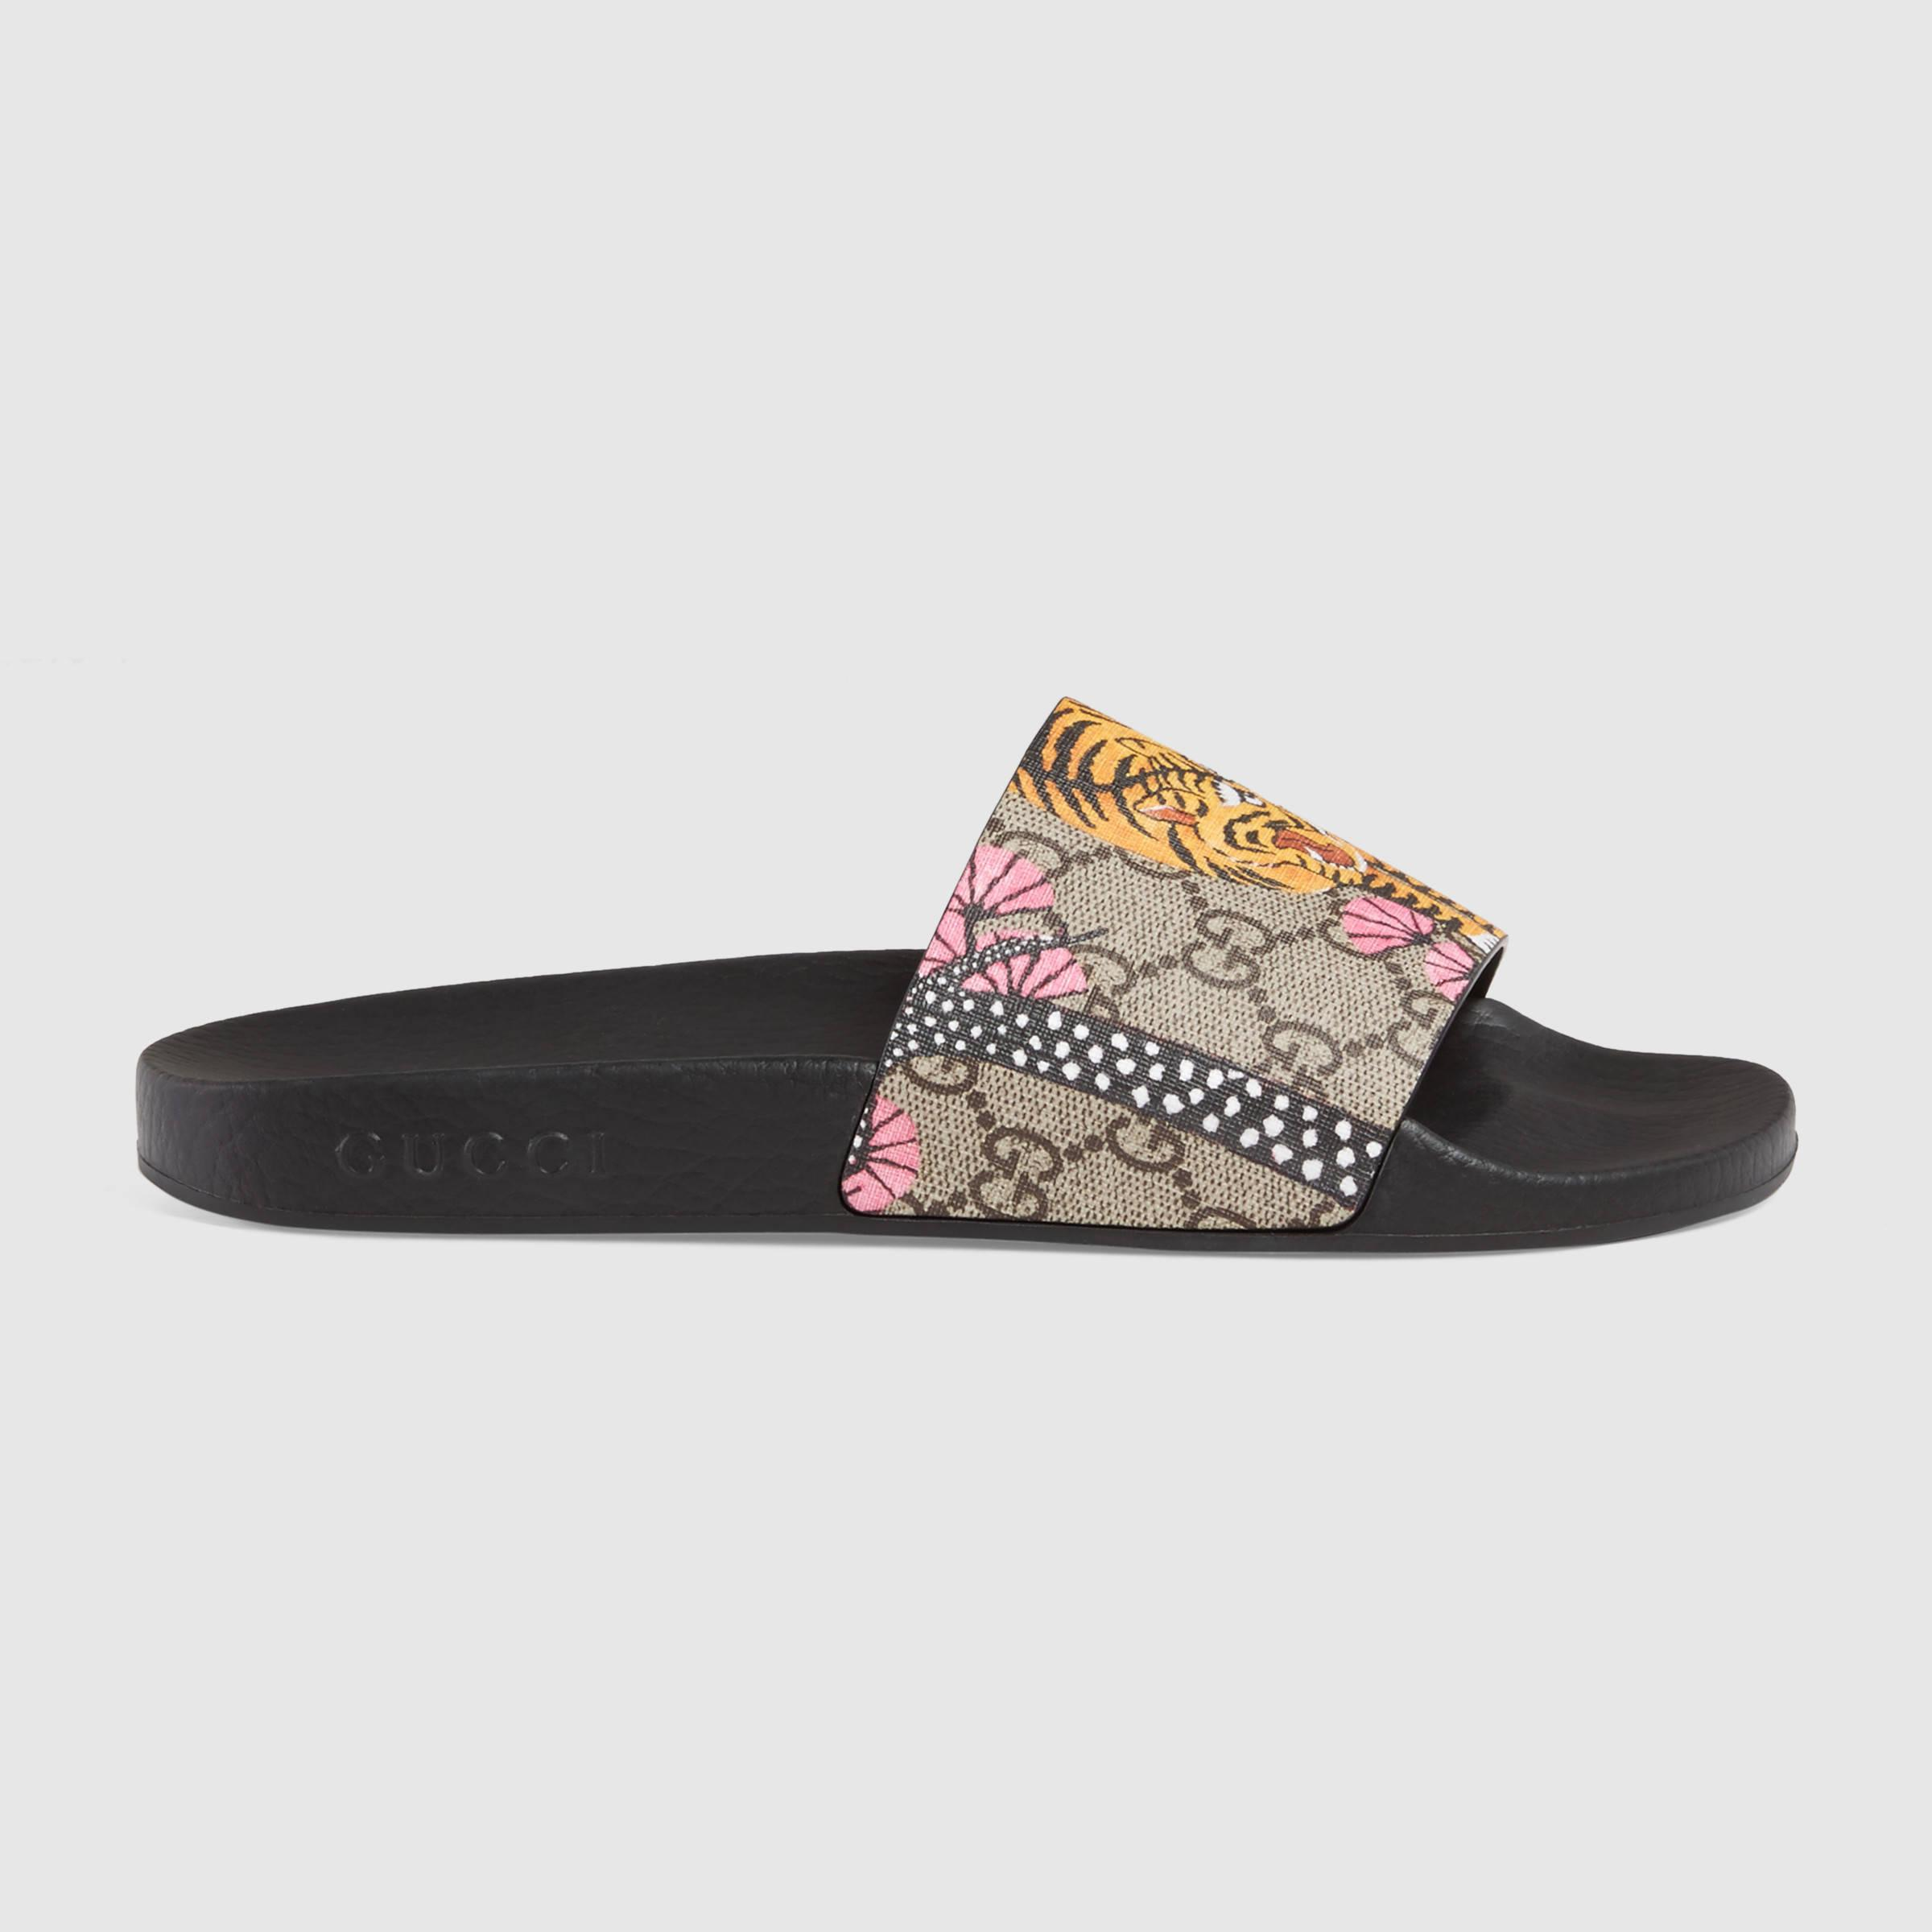 f1b33e23c Gucci Pursuit Bengal Slide Sandal - Lyst